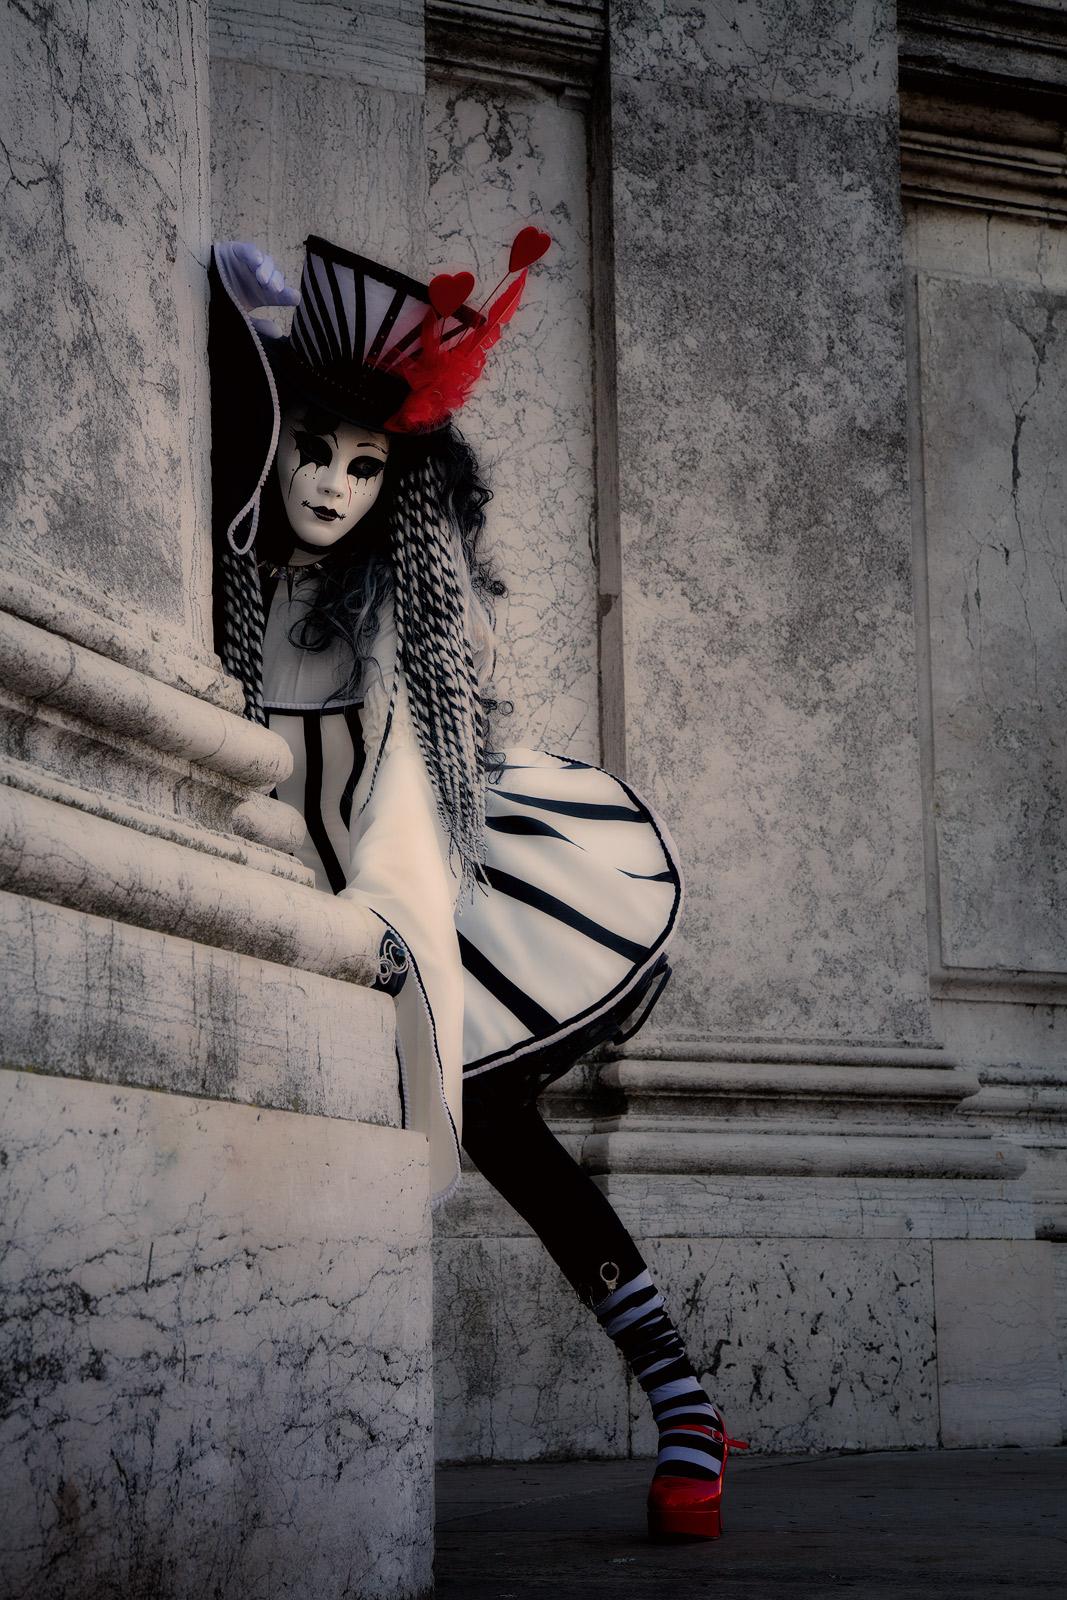 black & white, black and white, carnival, celebration, colorful, costume, daniela, daniela schmid, europe, italy, mask, party, san gorgio, venice, vertical, black & white, photo